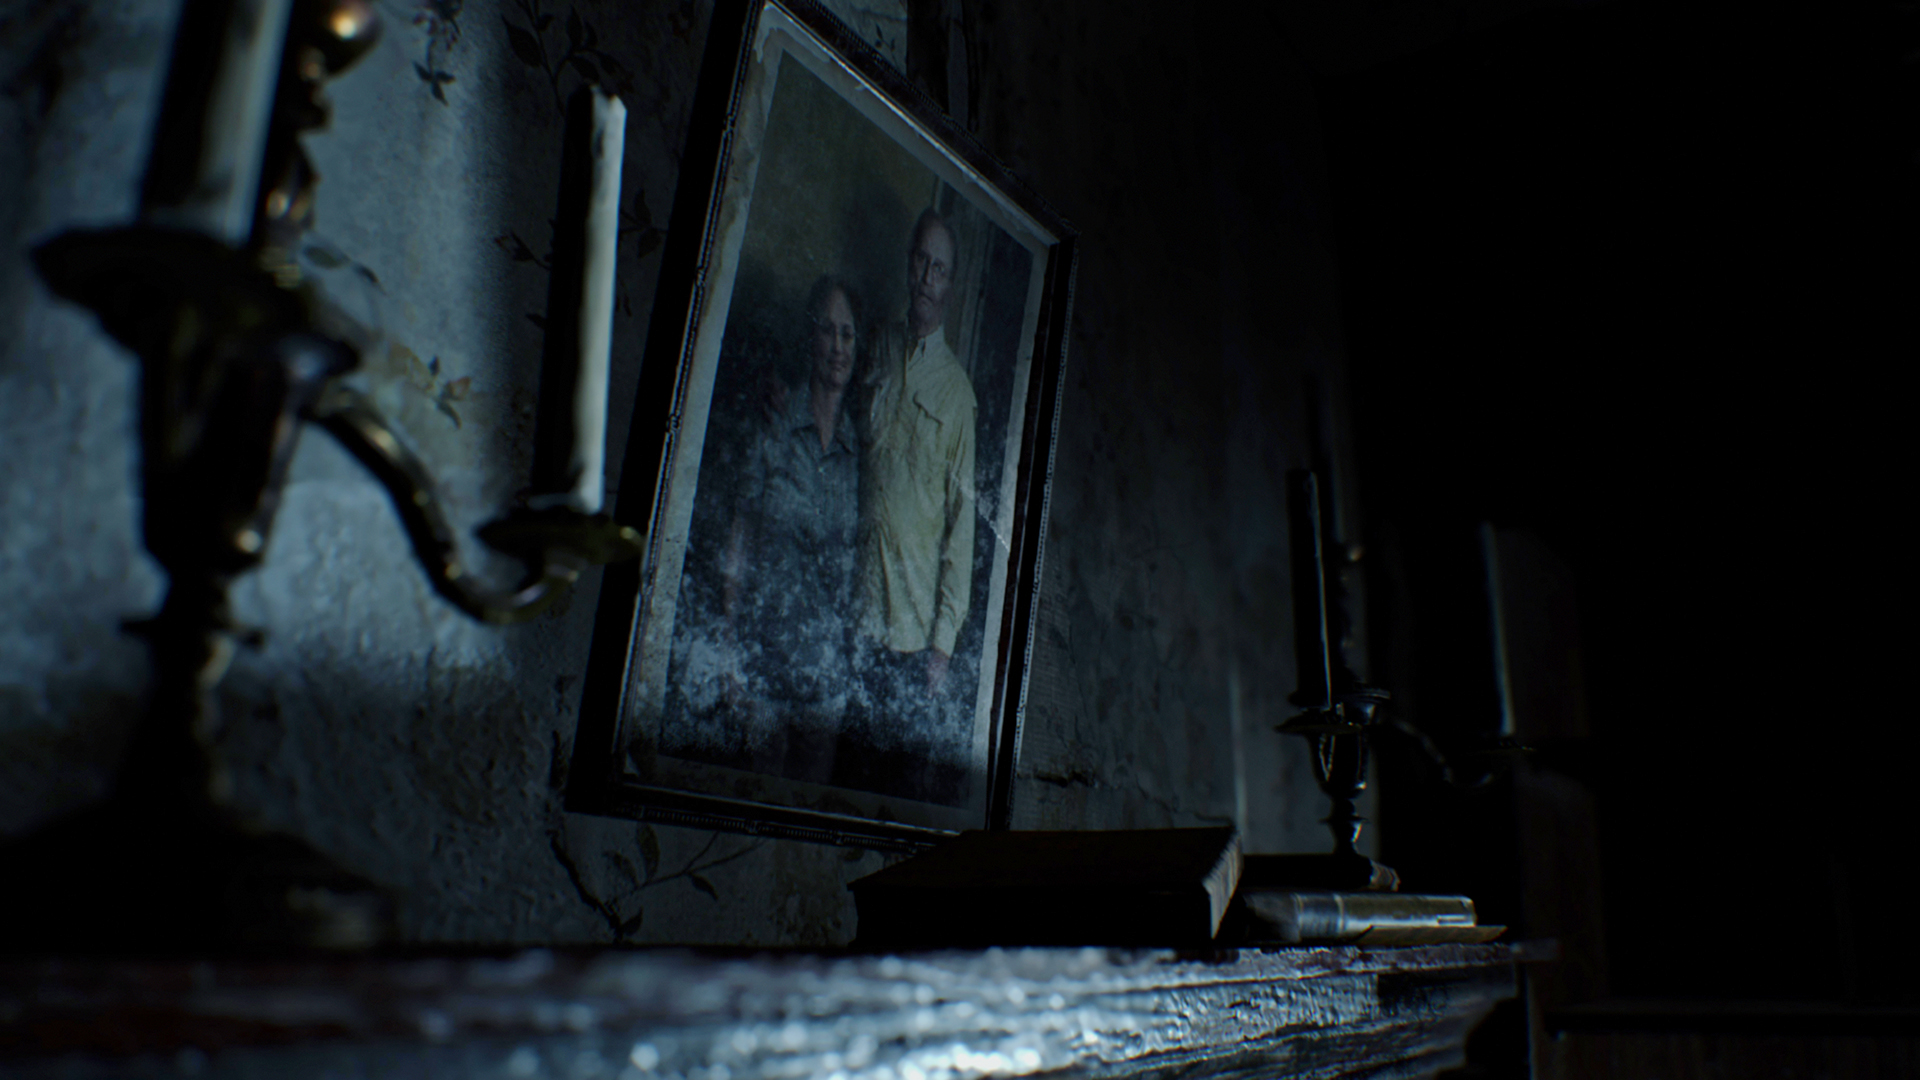 resident-evil-7-beginning-hour-screenshot- (8)